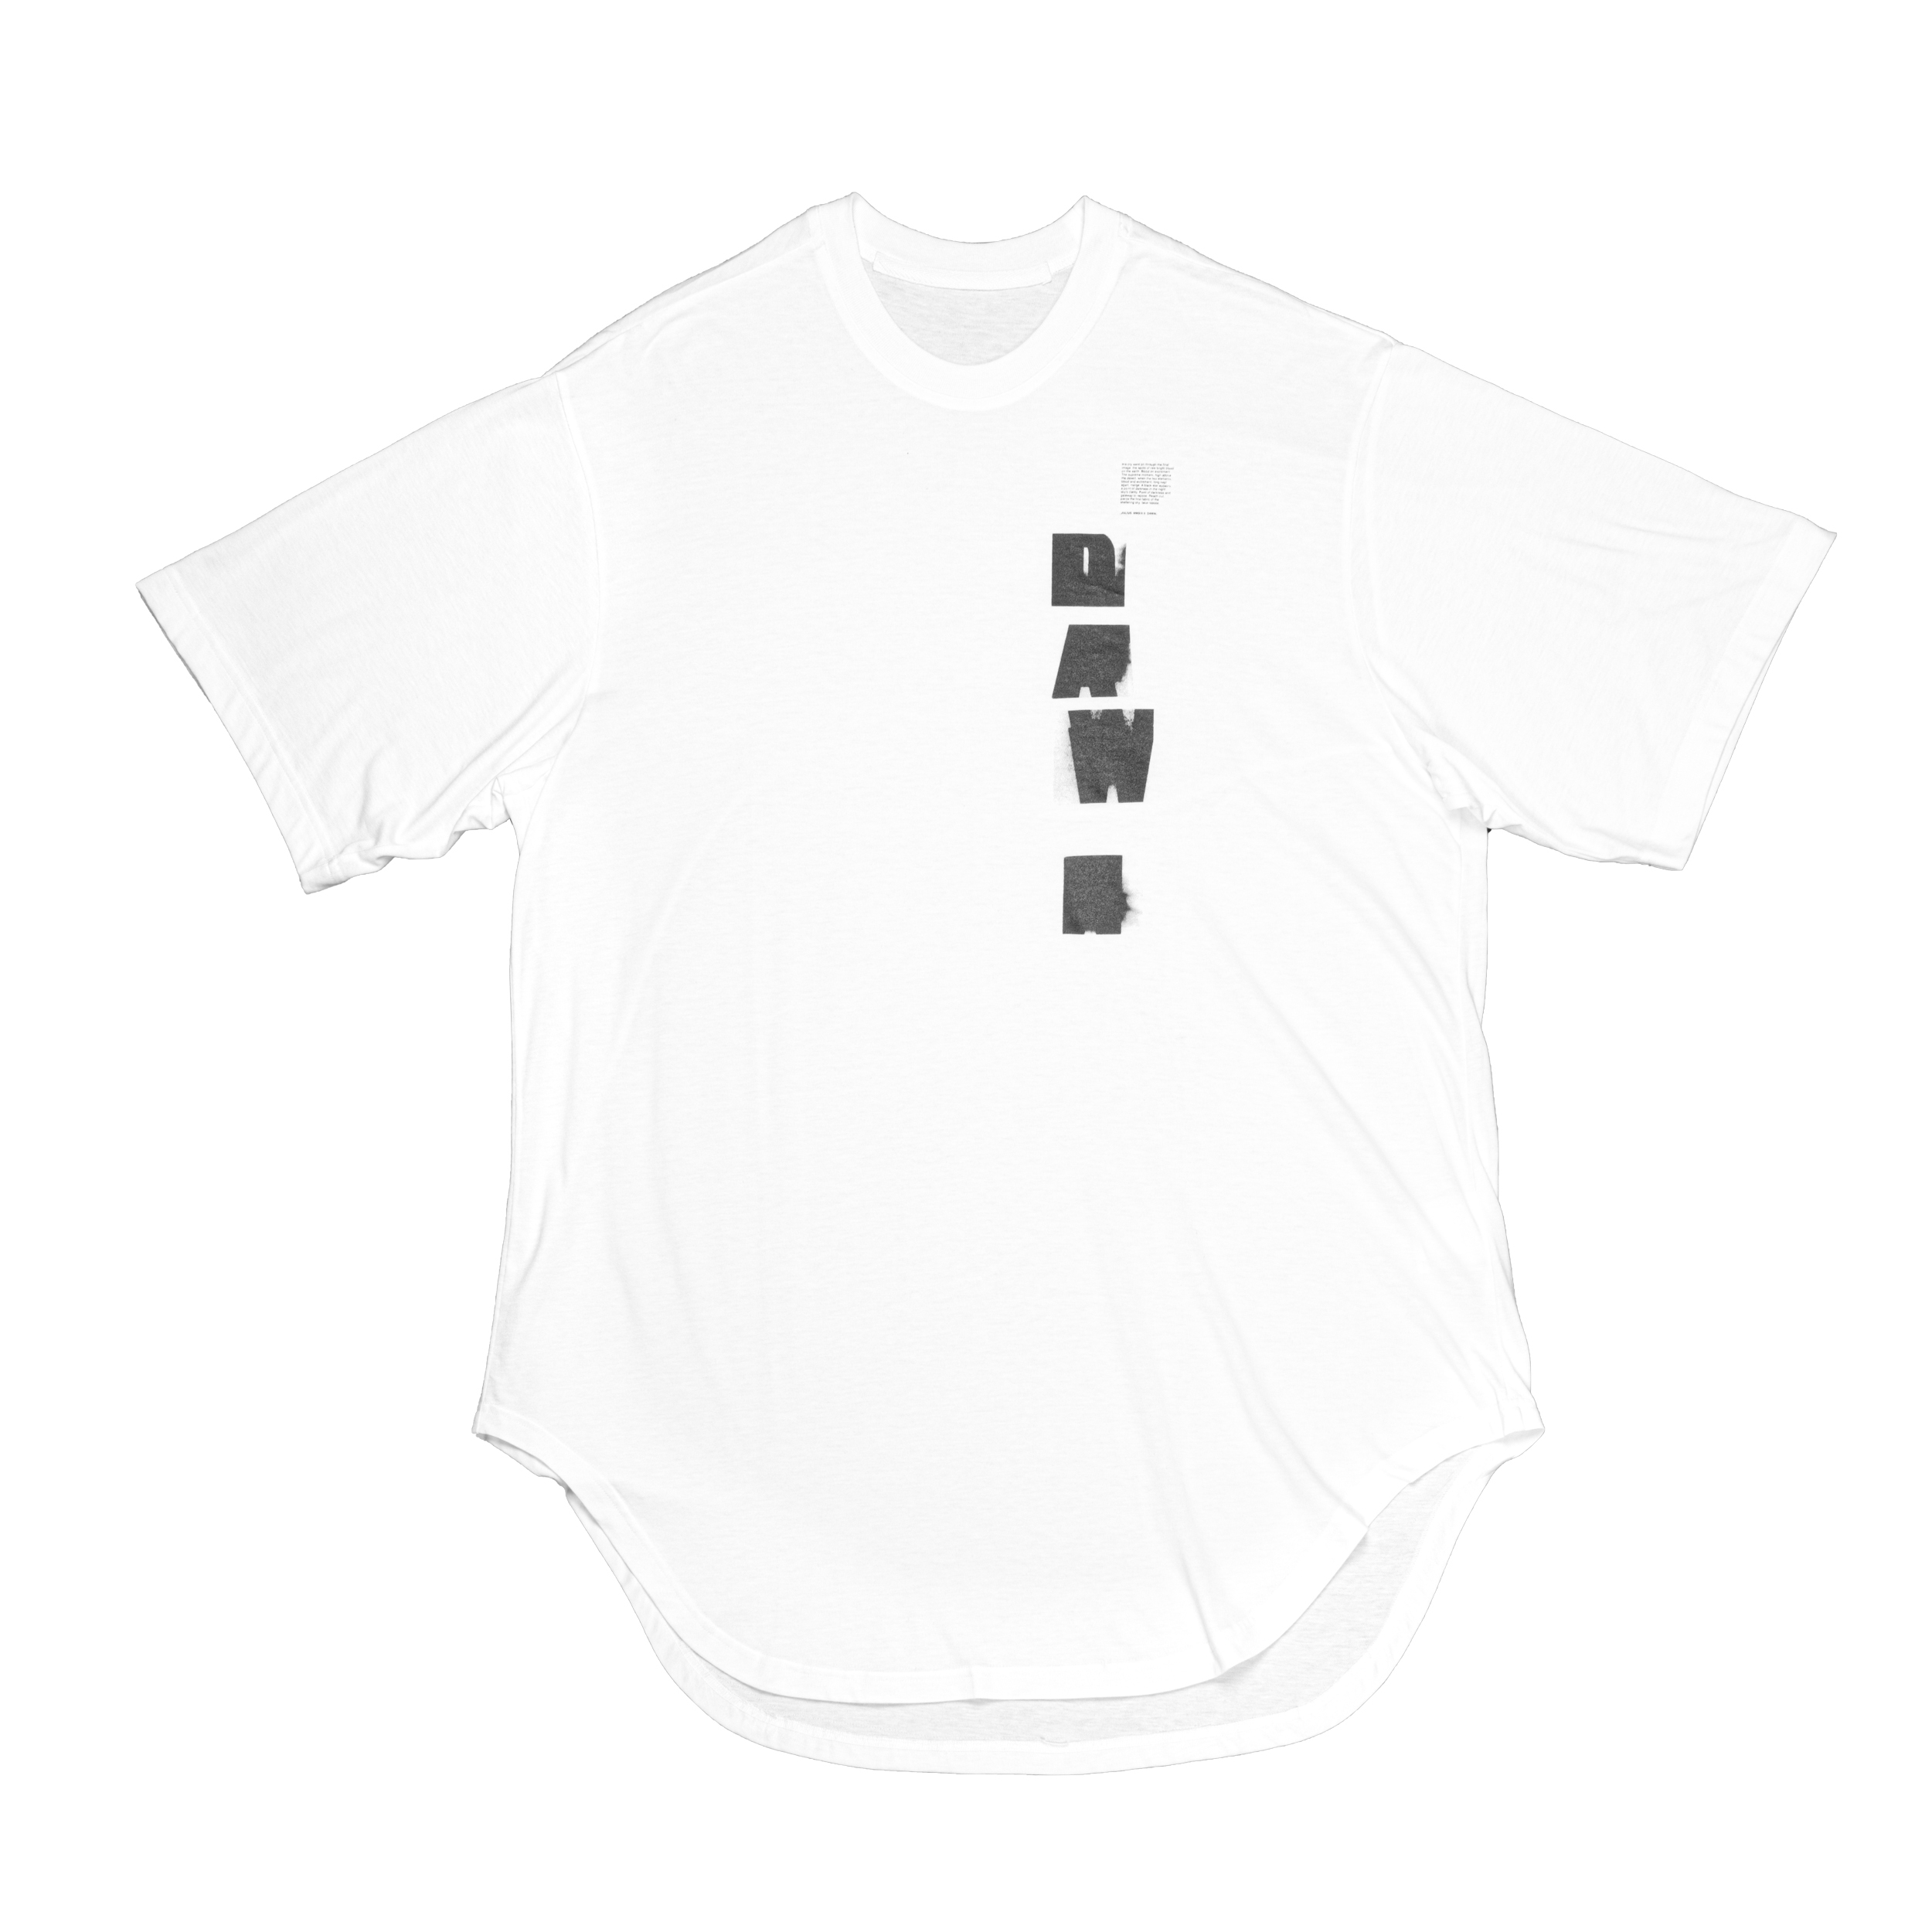 667CPM1-WHITE / DAWN Tシャツ